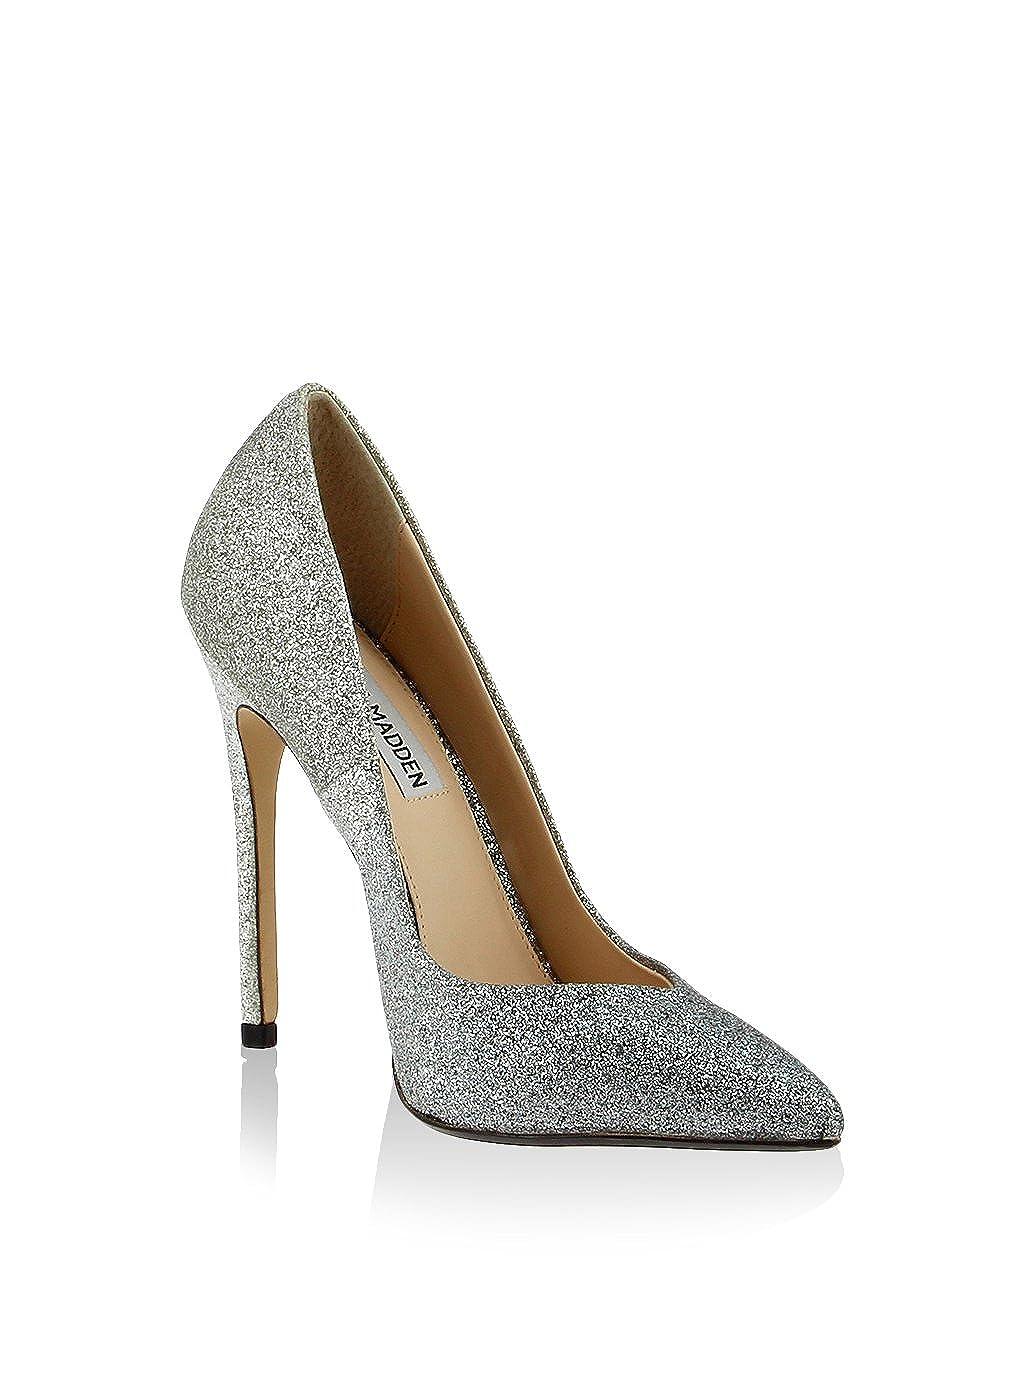 Wicketg Silver Glitter Pumps-3.5